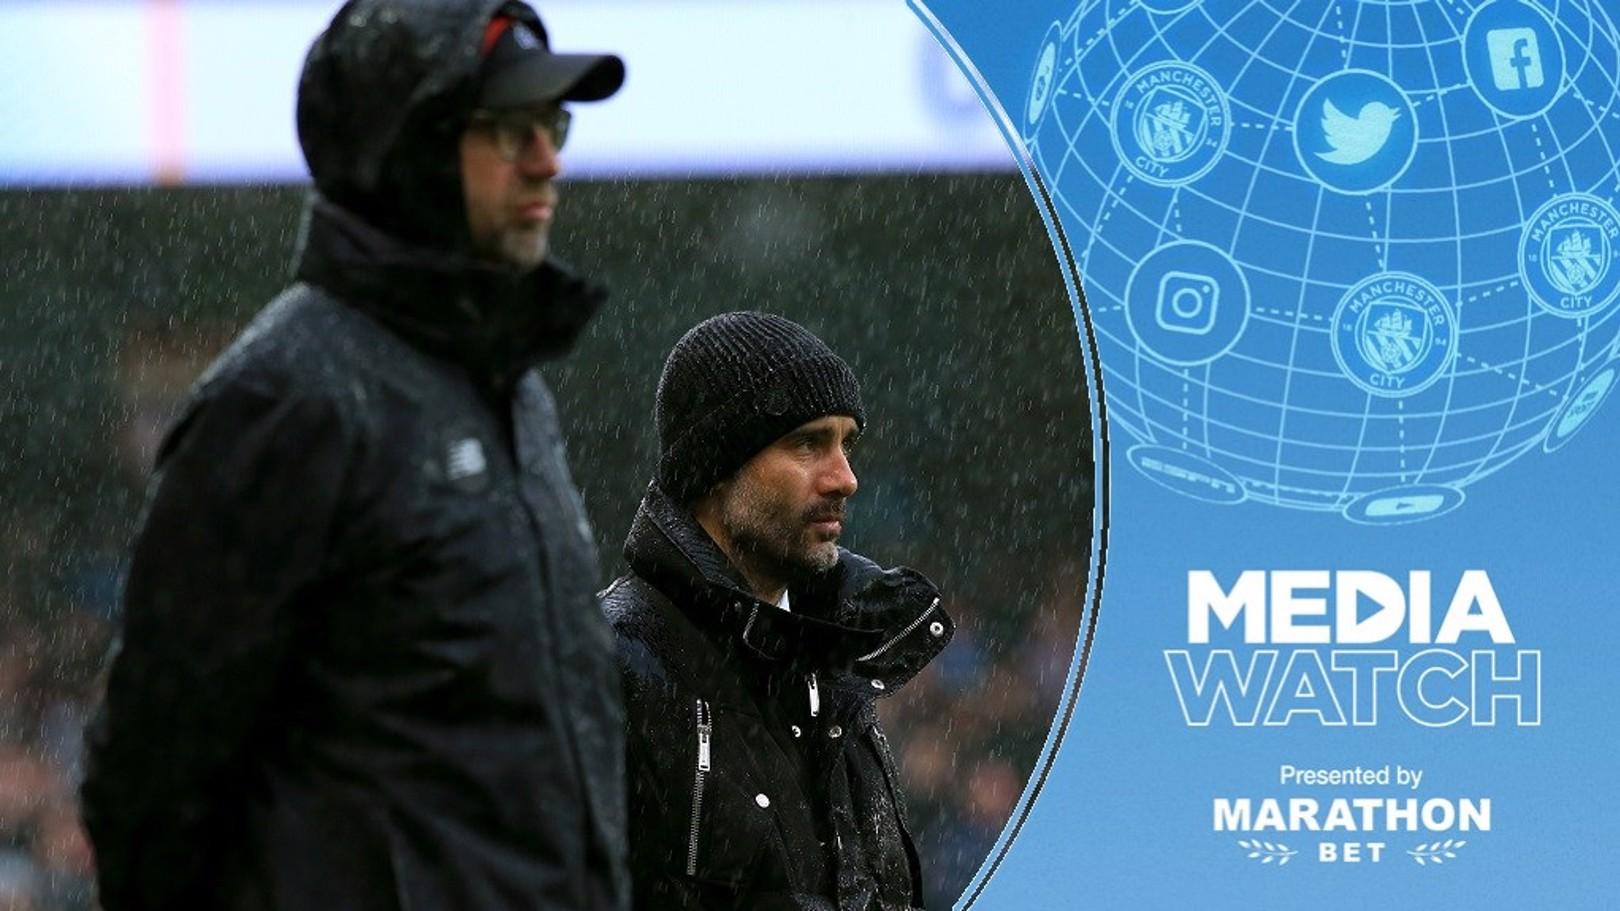 Media Watch: Liverpool boss praises City's hunger